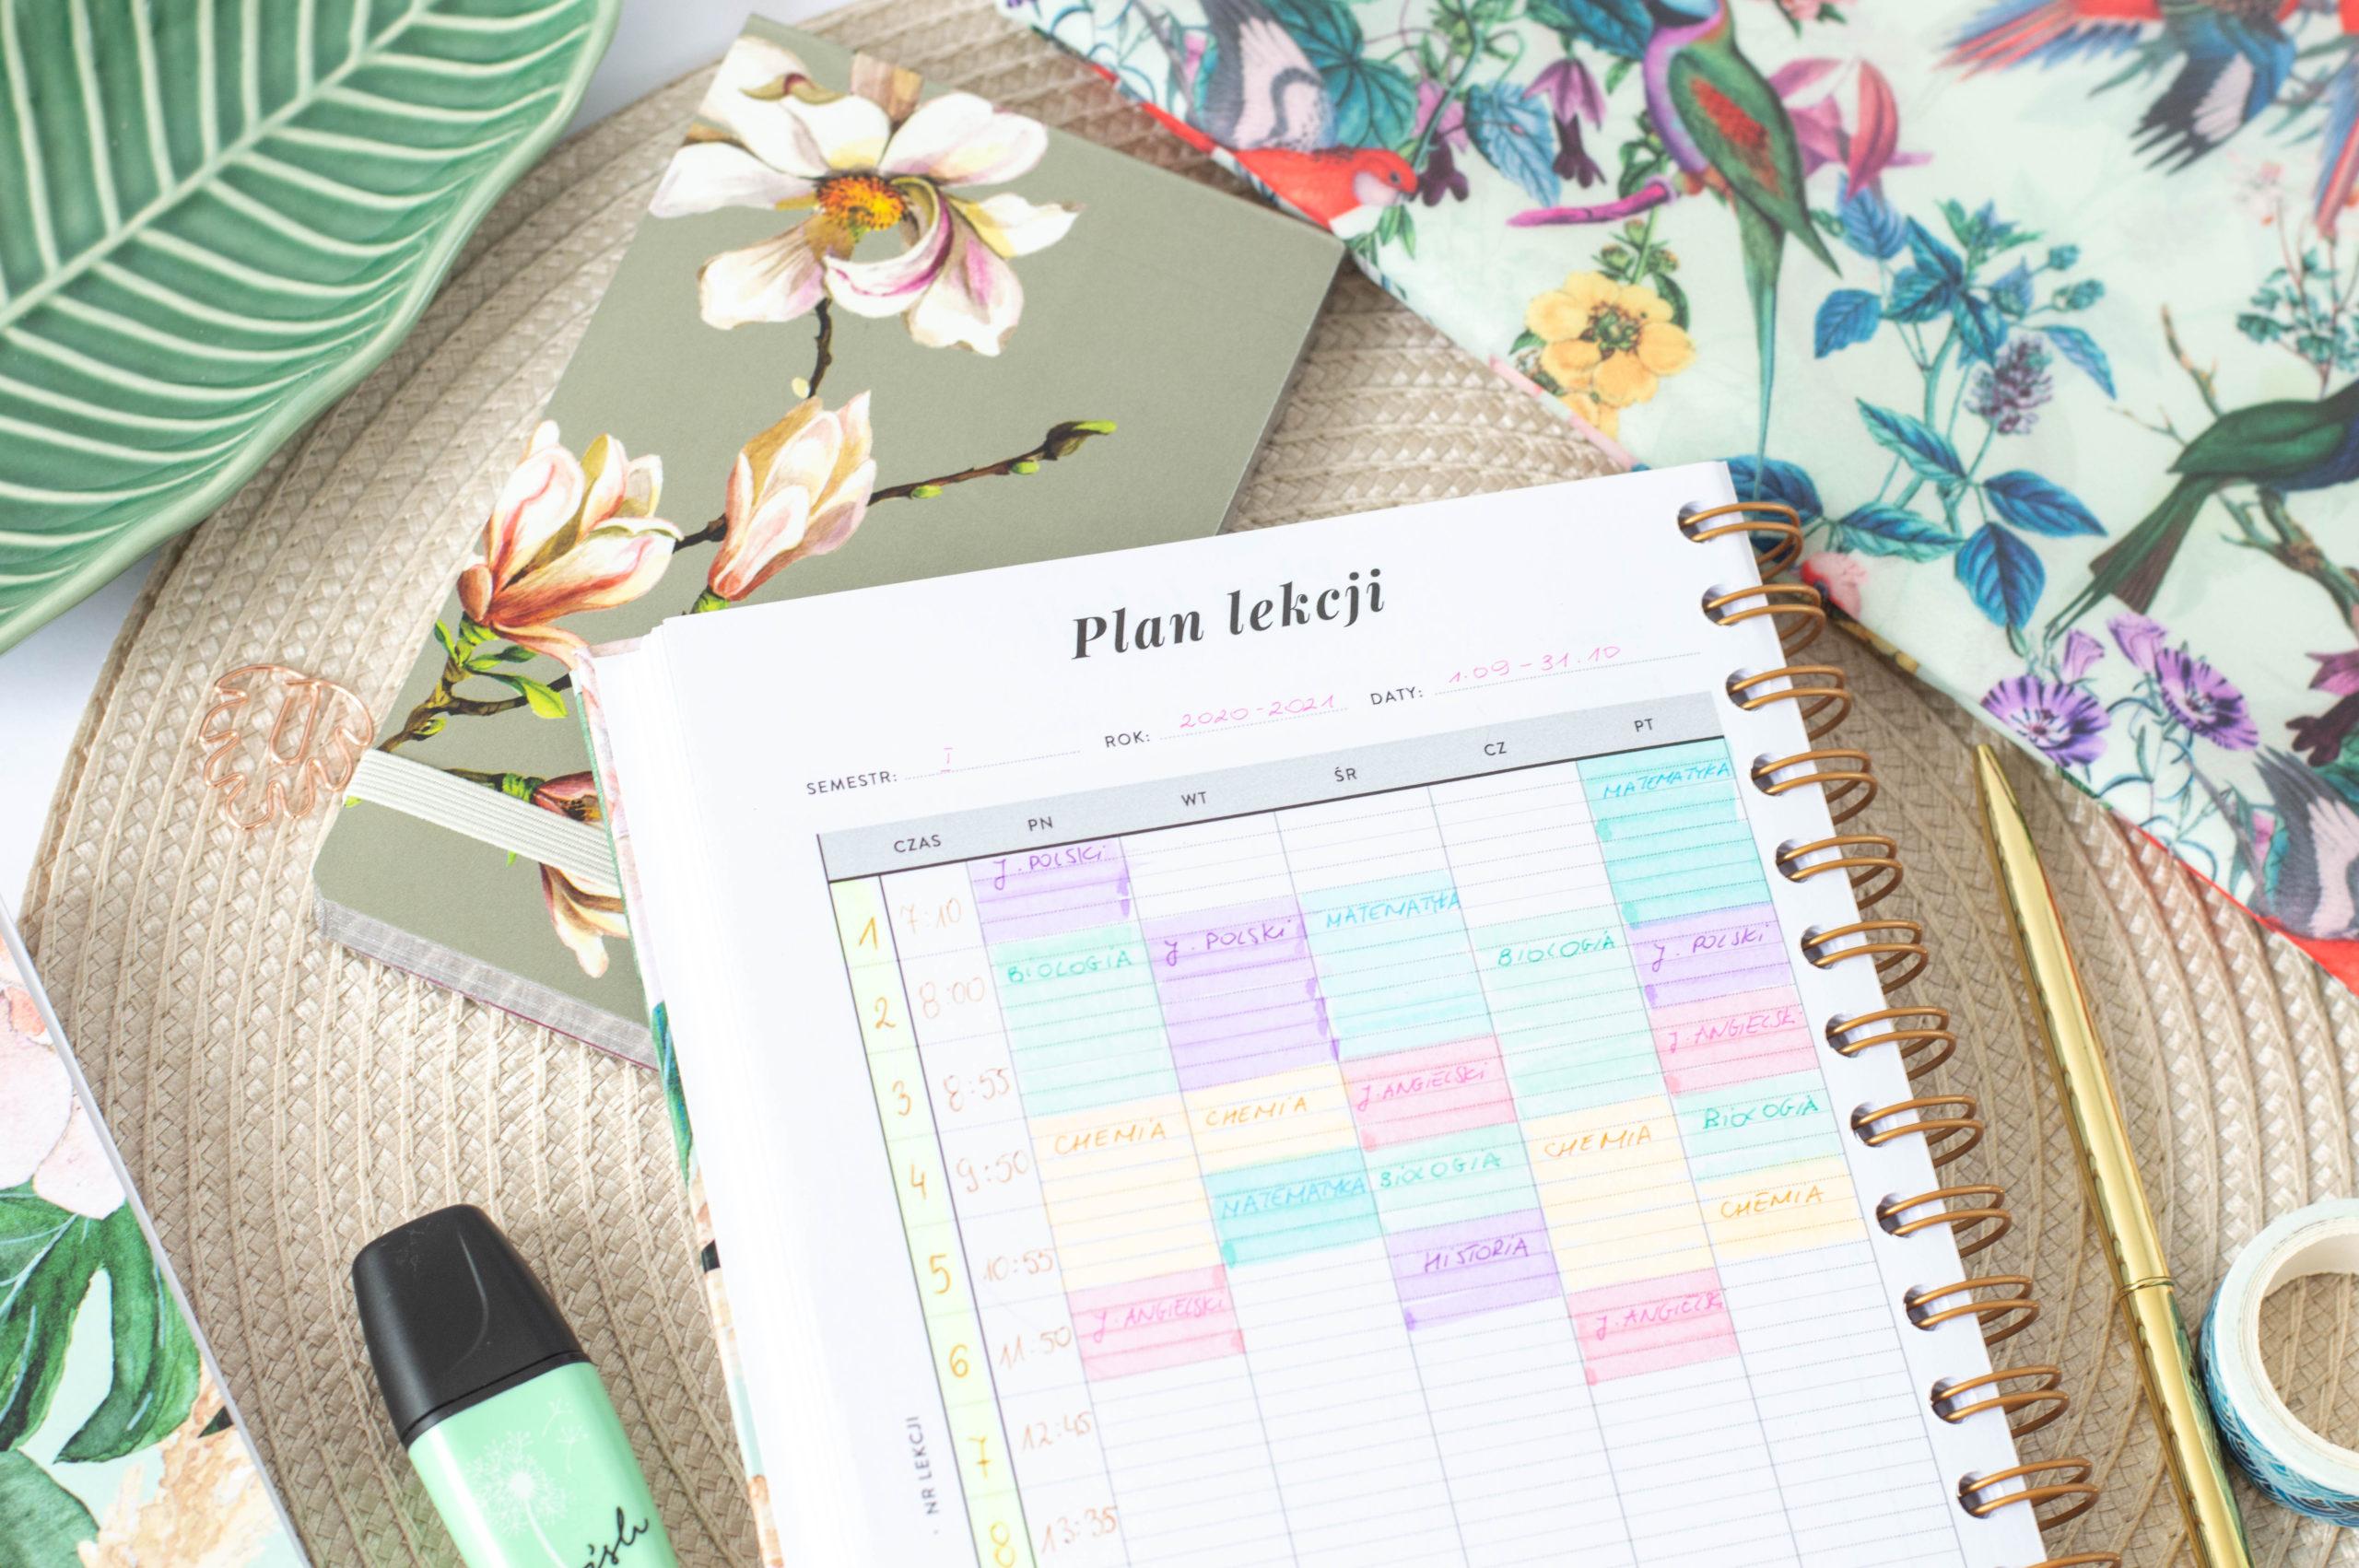 plan-lekcji4-planer-2020-2021-ucznia